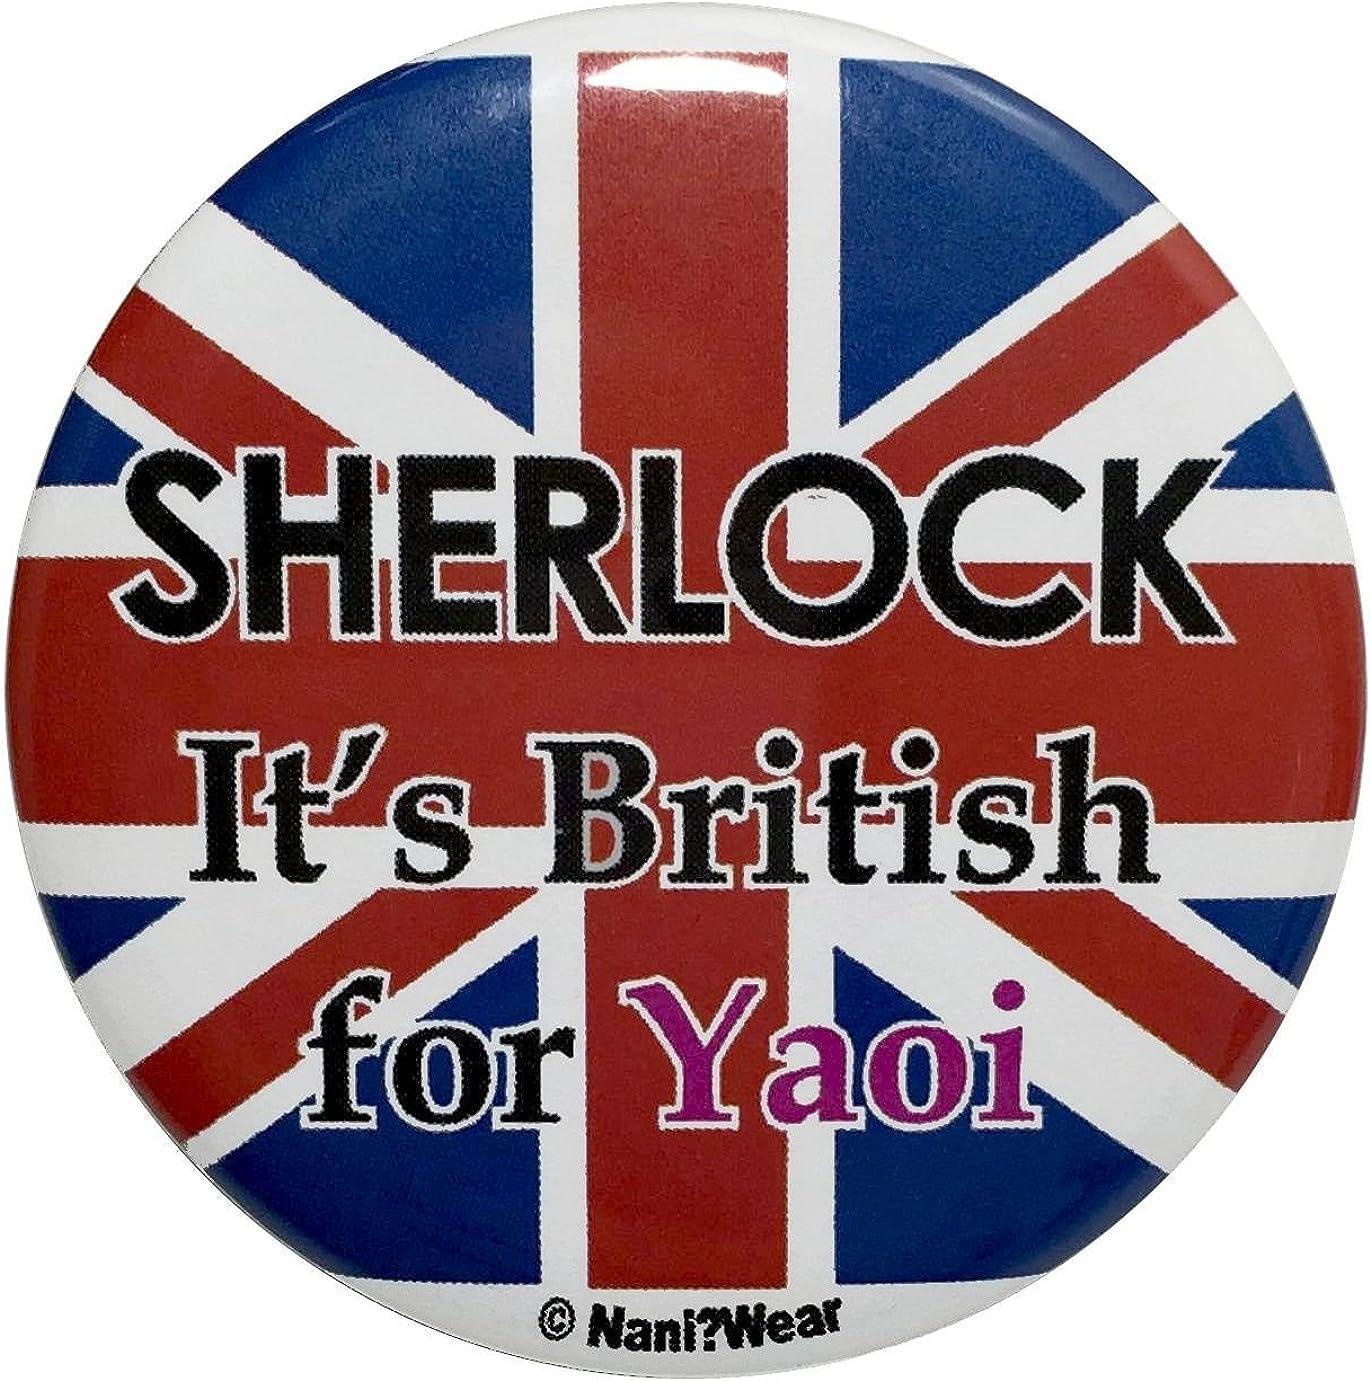 NaniWear Sherlock Benedict Cumberbatch 2.25 Inch Button Sherlock is British for Yaoi